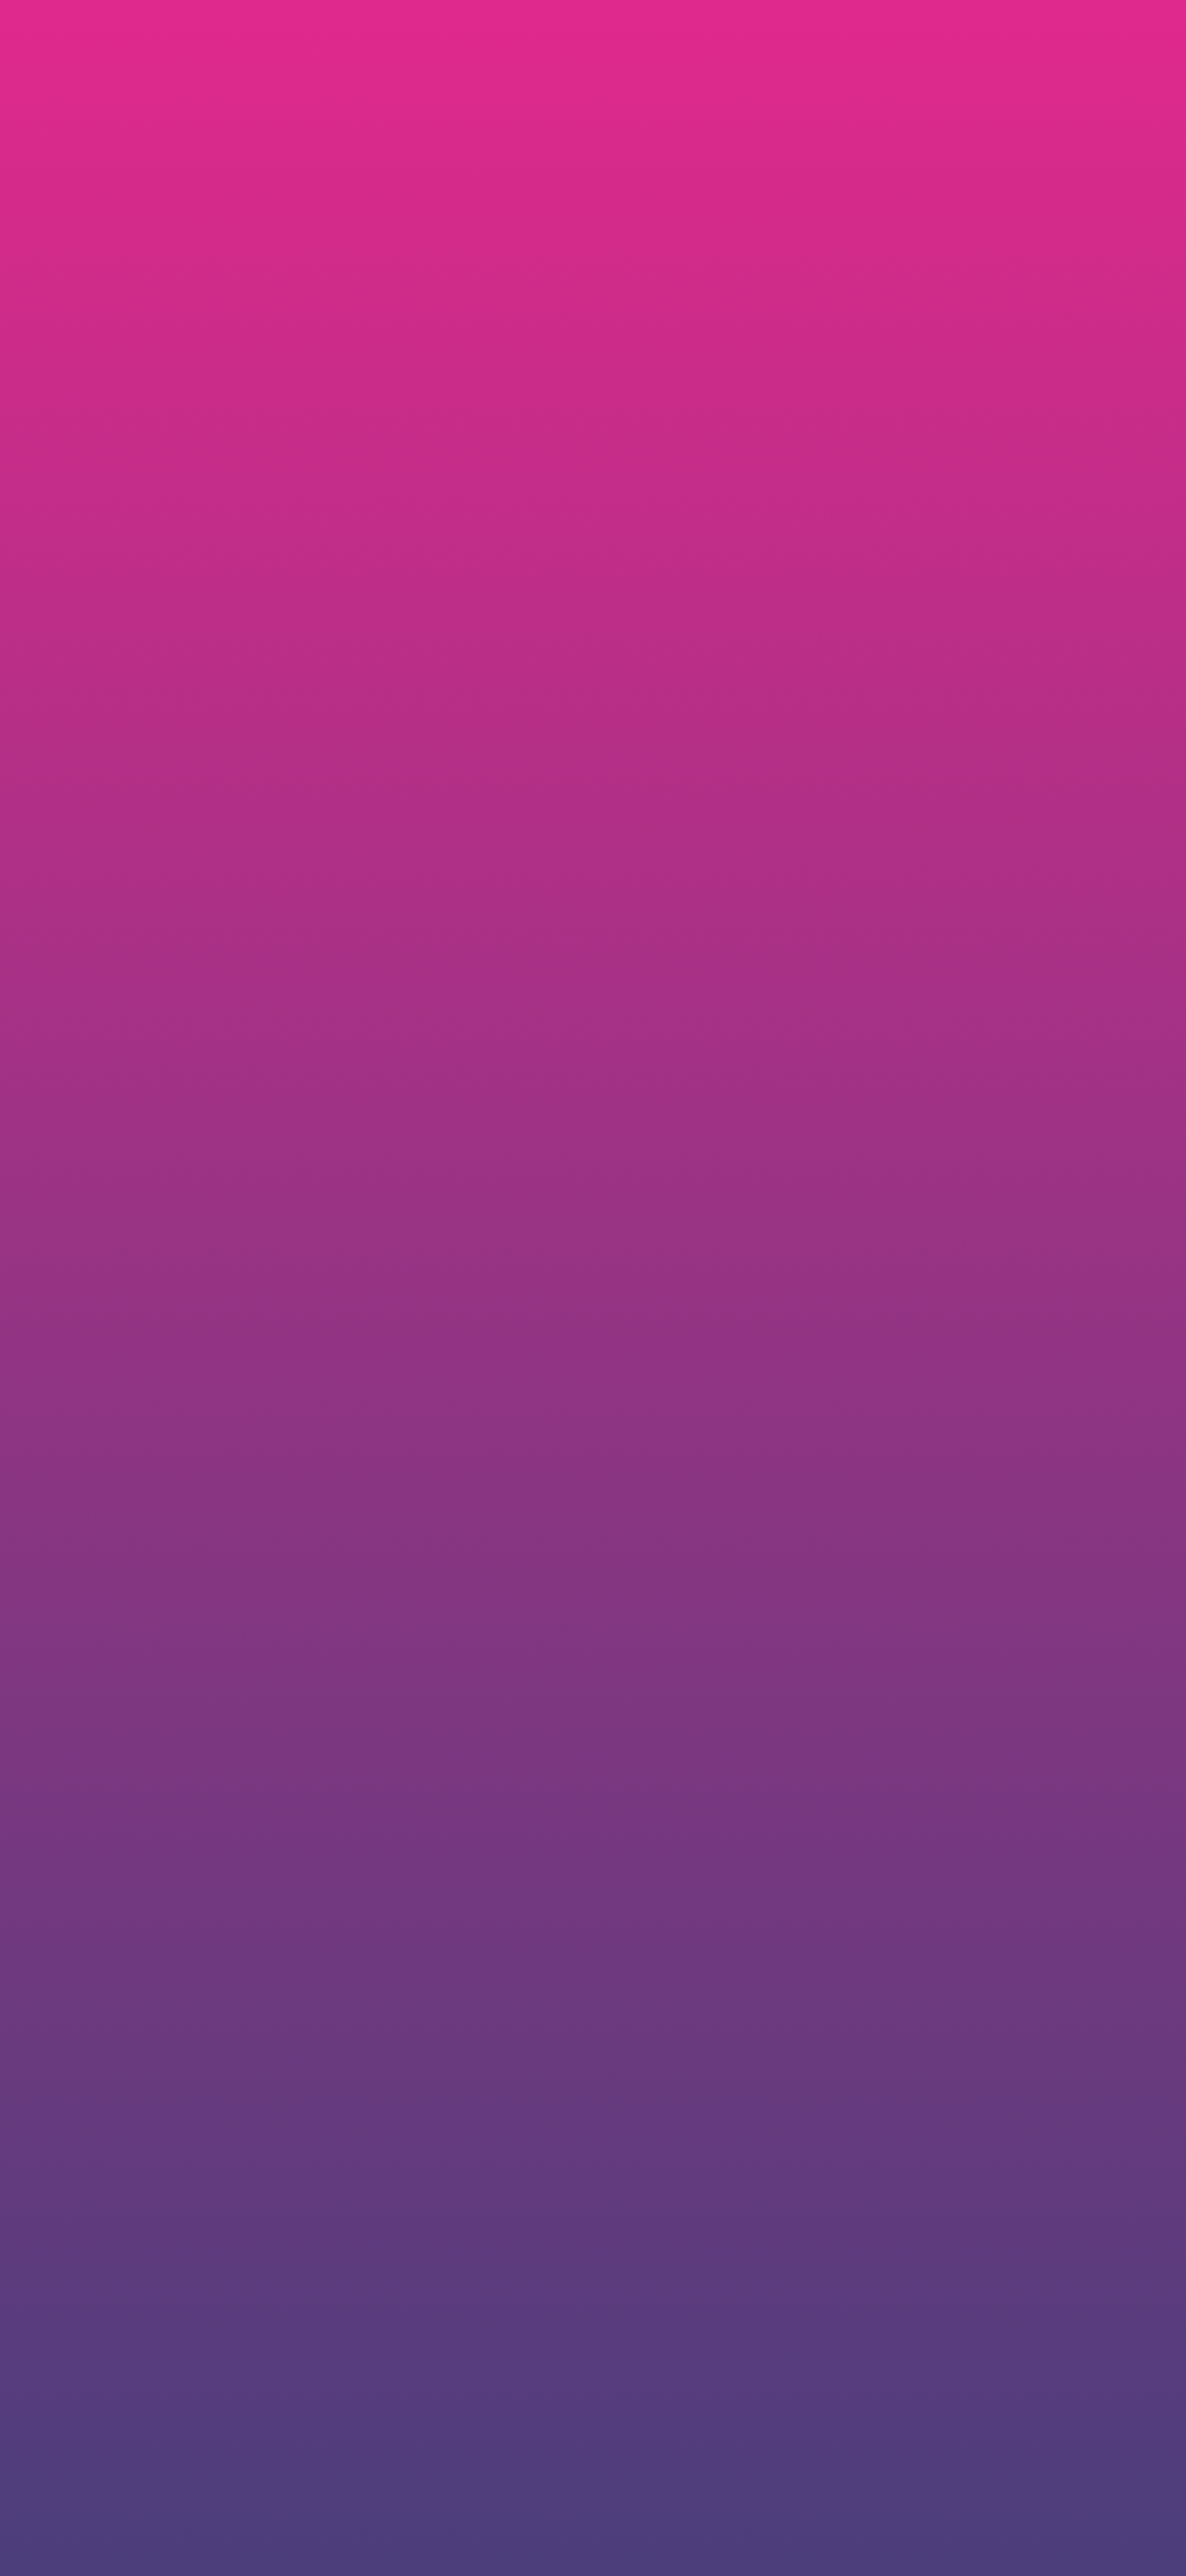 macOS gradient wallpaper by AR7 idownloadblog v3 by AR7 pink purple